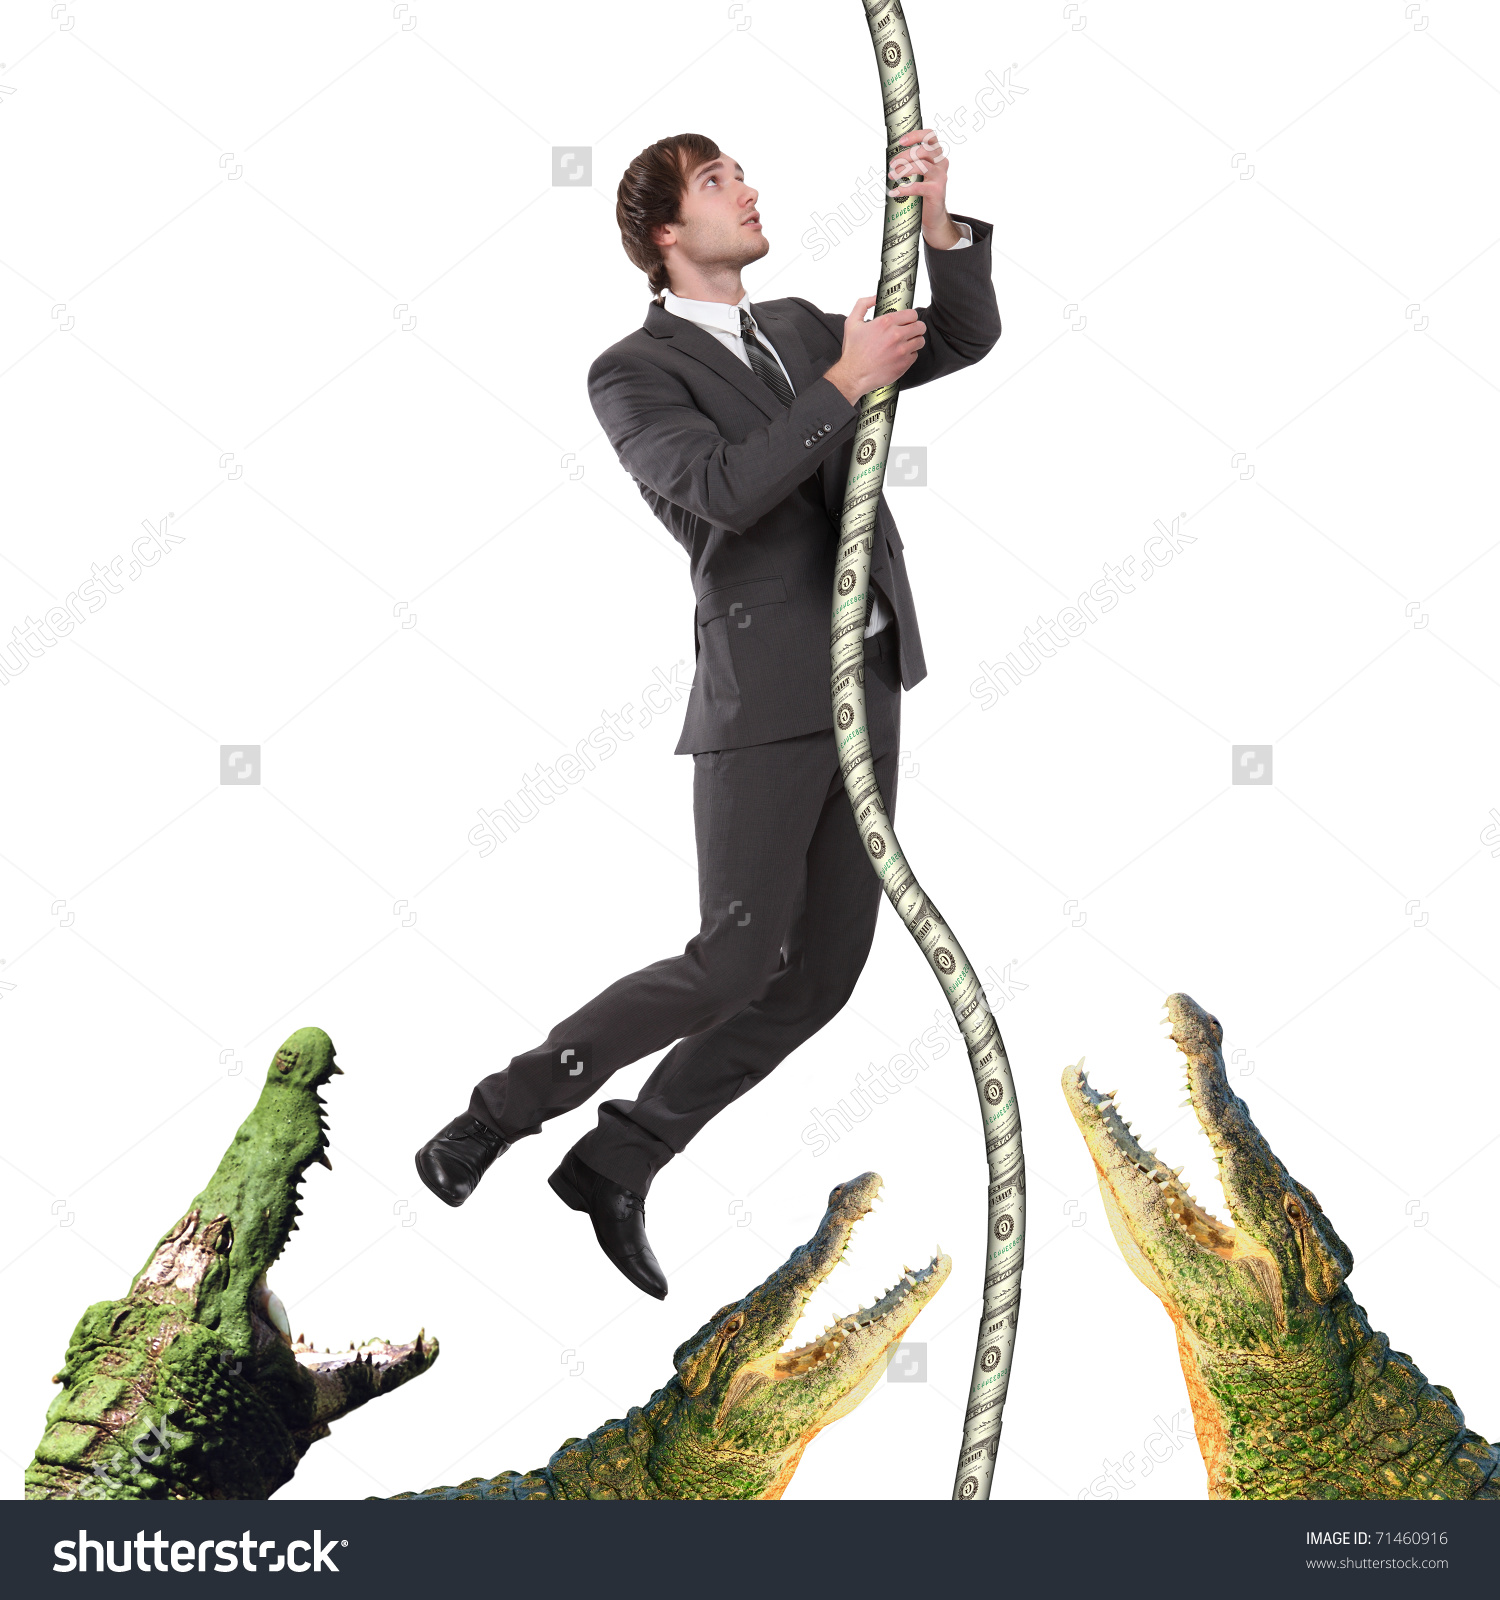 Business Man Black Suit Climbing Rope Stock Illustration 71460916.